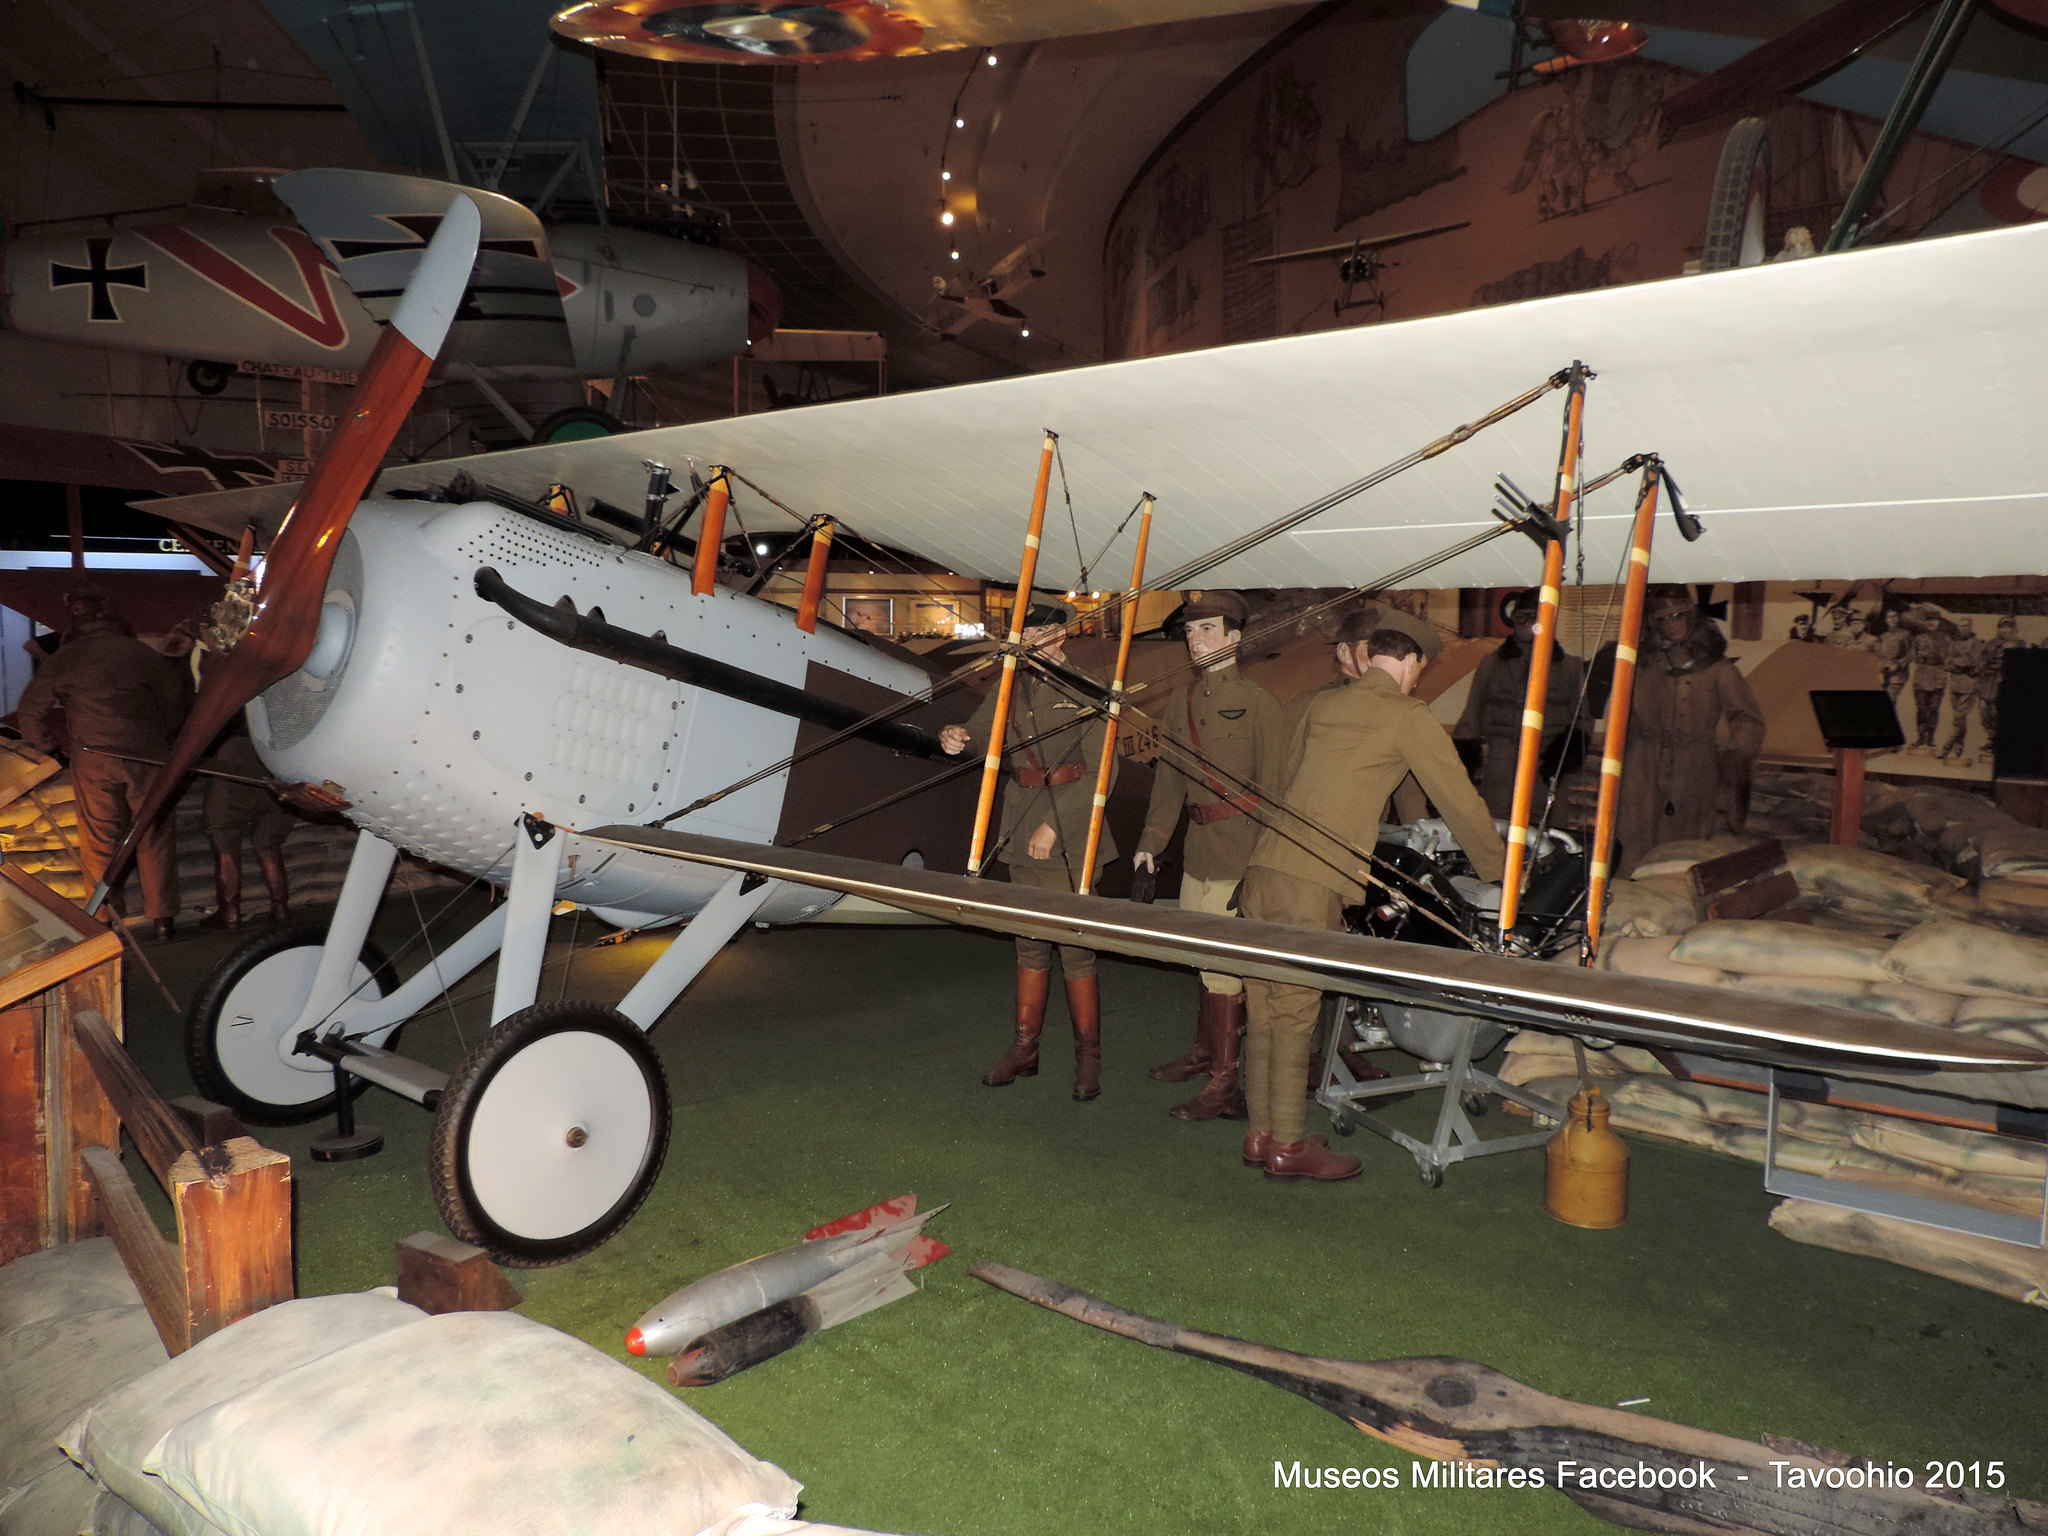 SPAD VIIc1 s n B9916 RAF - Se encuentra exhibido en San Diego, CA